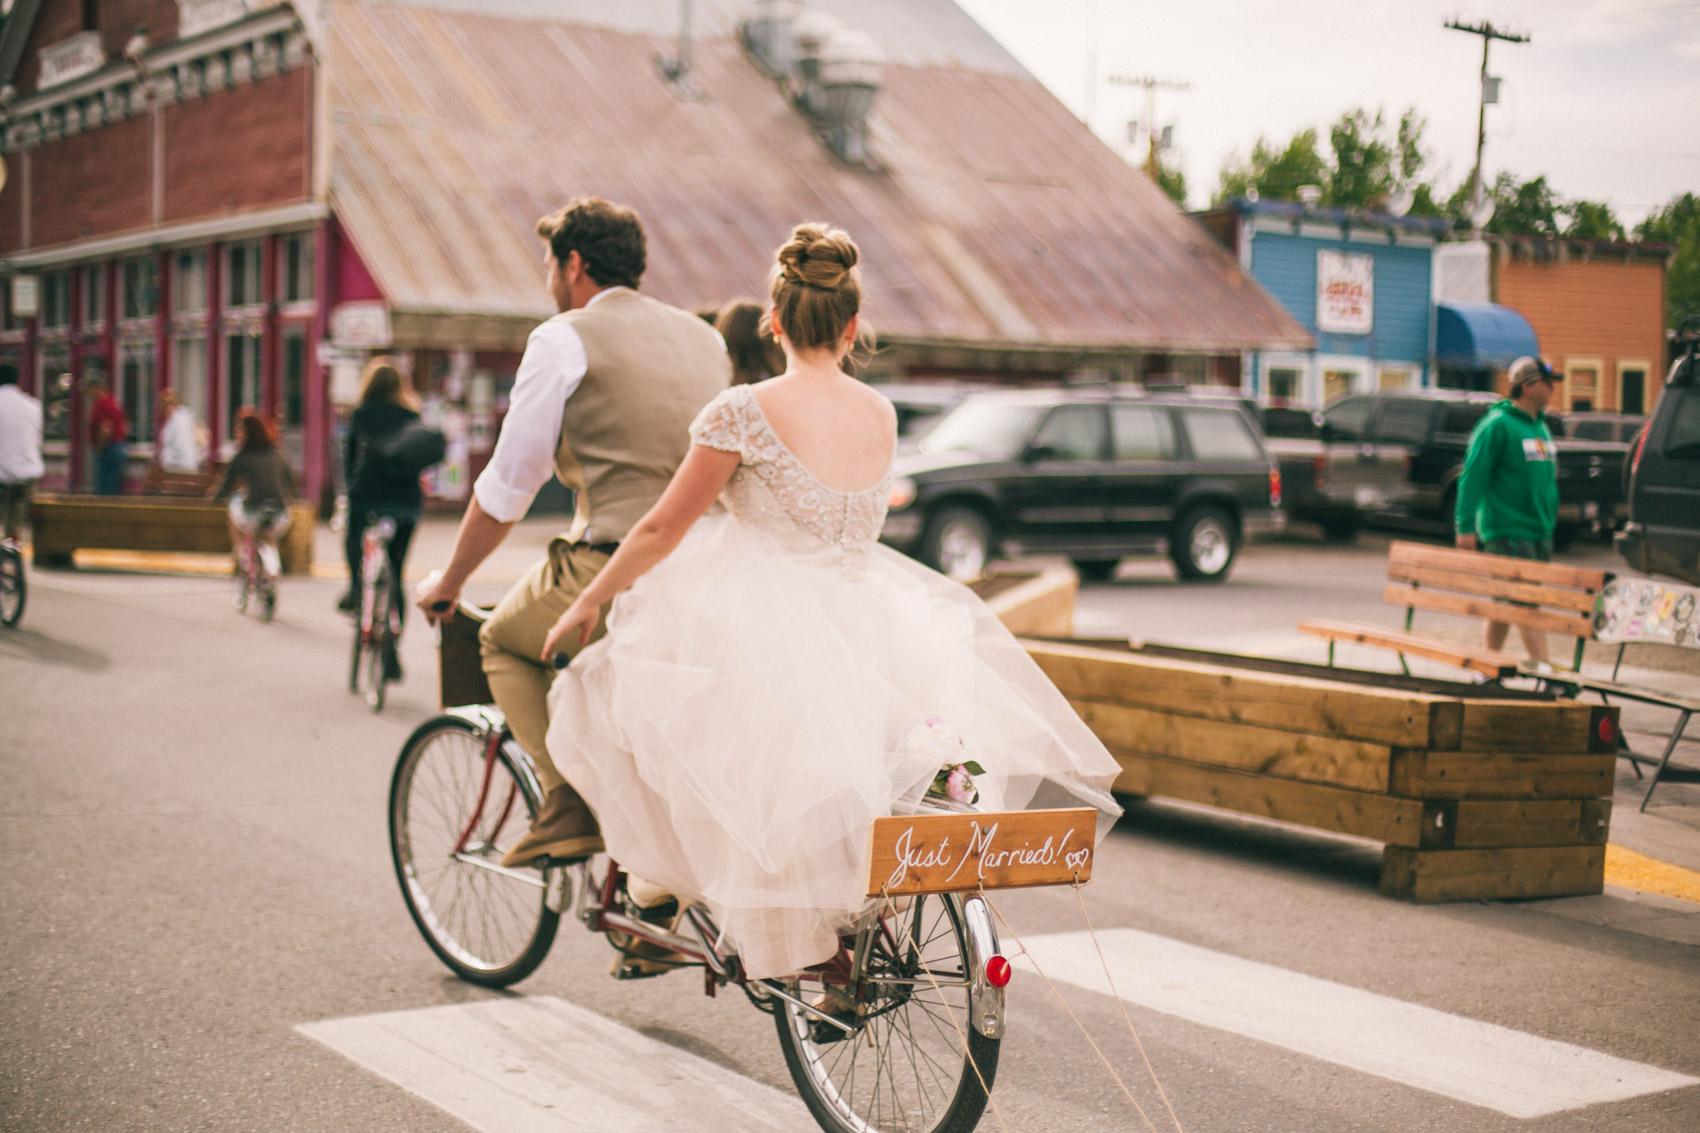 044_Crested Butte Wedding Photographer Secret Stash Woods Walk Ceremony Jamie Blue Bird Events Boho Epic Stars